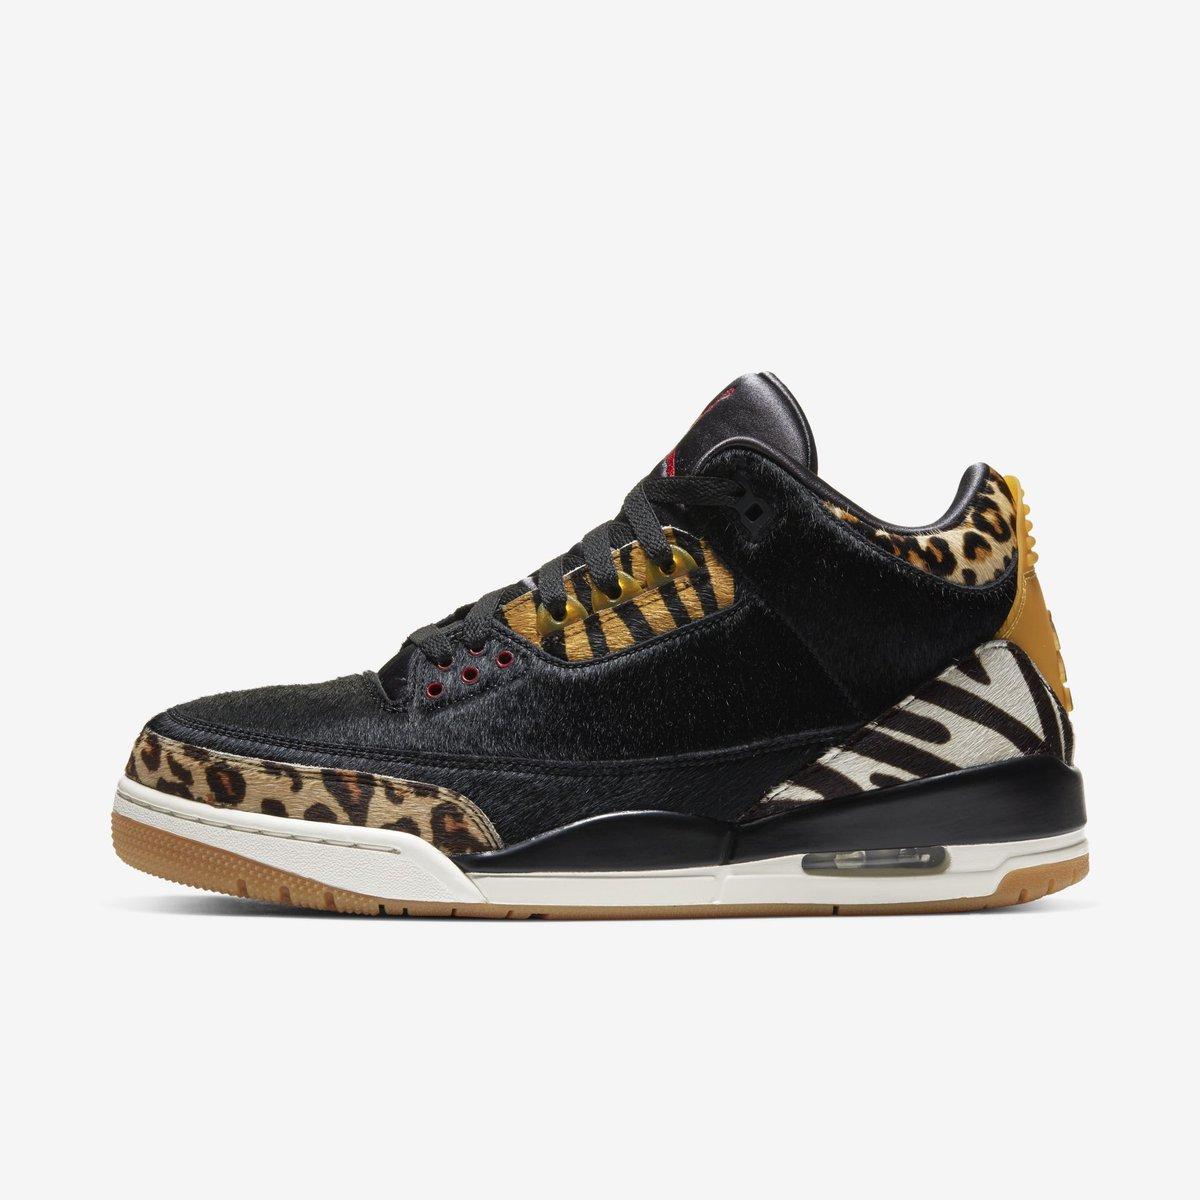 "SALE: Jordan 3 Retro ""Animal Instinct"" last sizes 10-11 only $179.97 (retail $225) on @nikestore. No code needed.  Link ->"